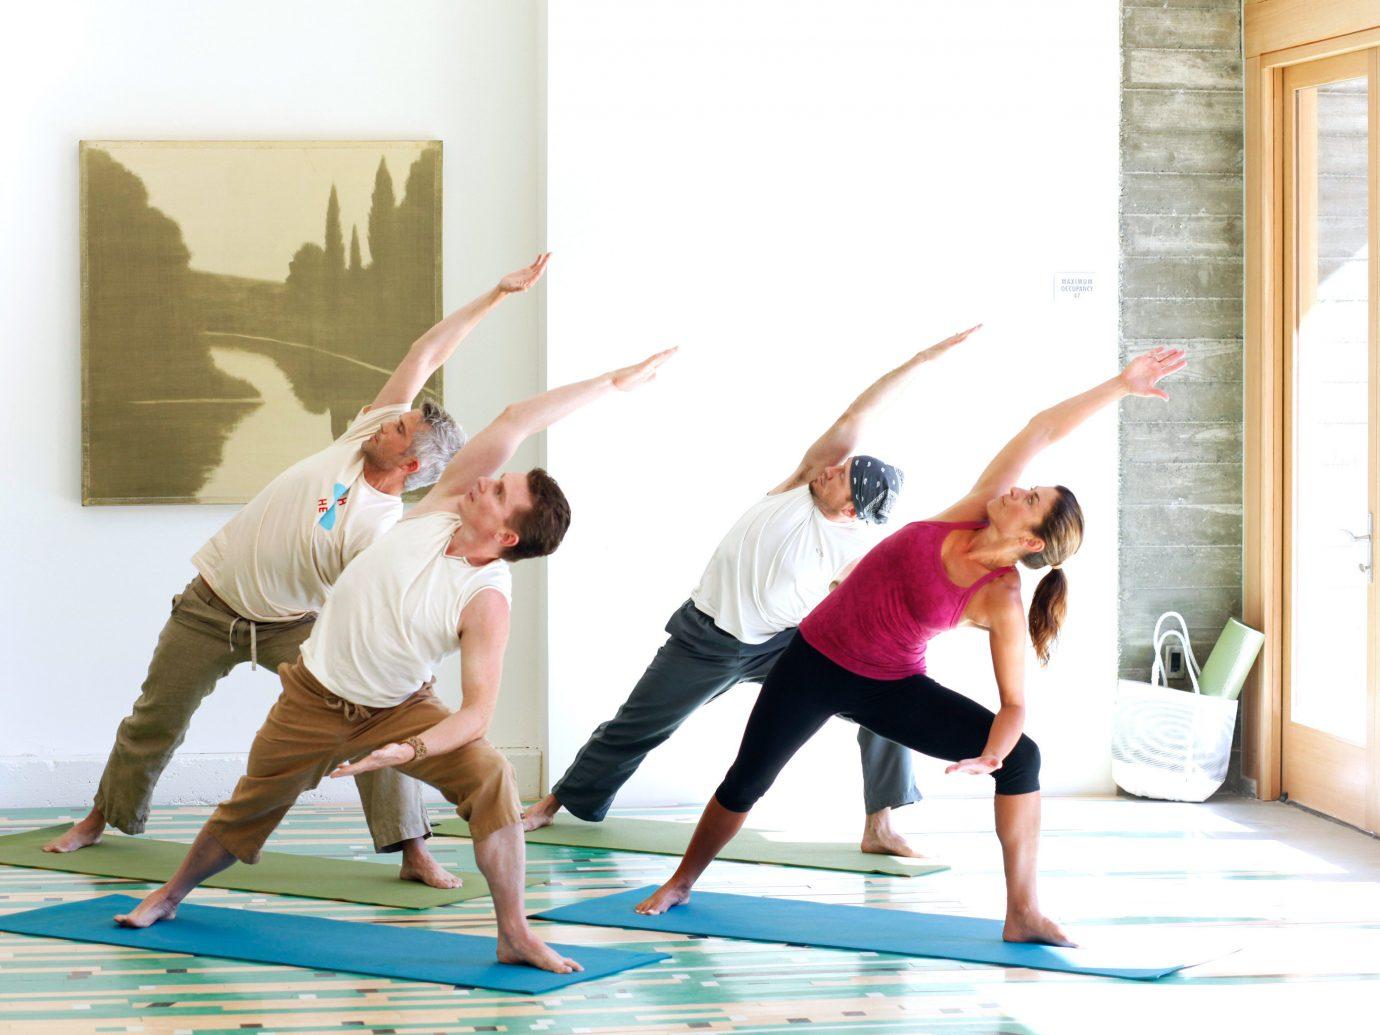 Fitness Health + Wellness Hotels Wellness Yoga Retreats person sports physical fitness Sport martial arts yoga modern dance contact sport combat sport concert dance striking combat sports